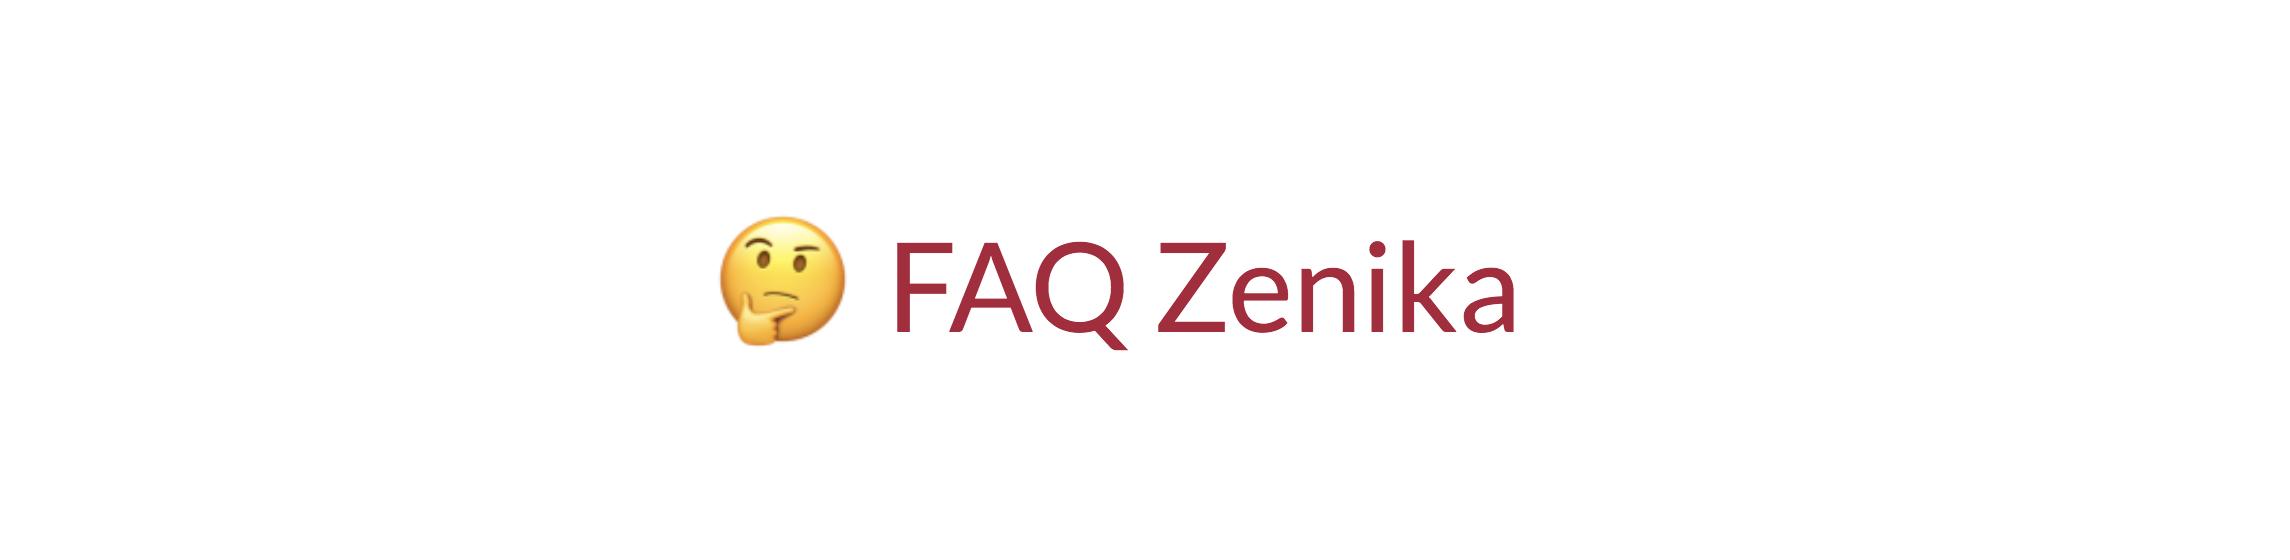 FAQ Zenika